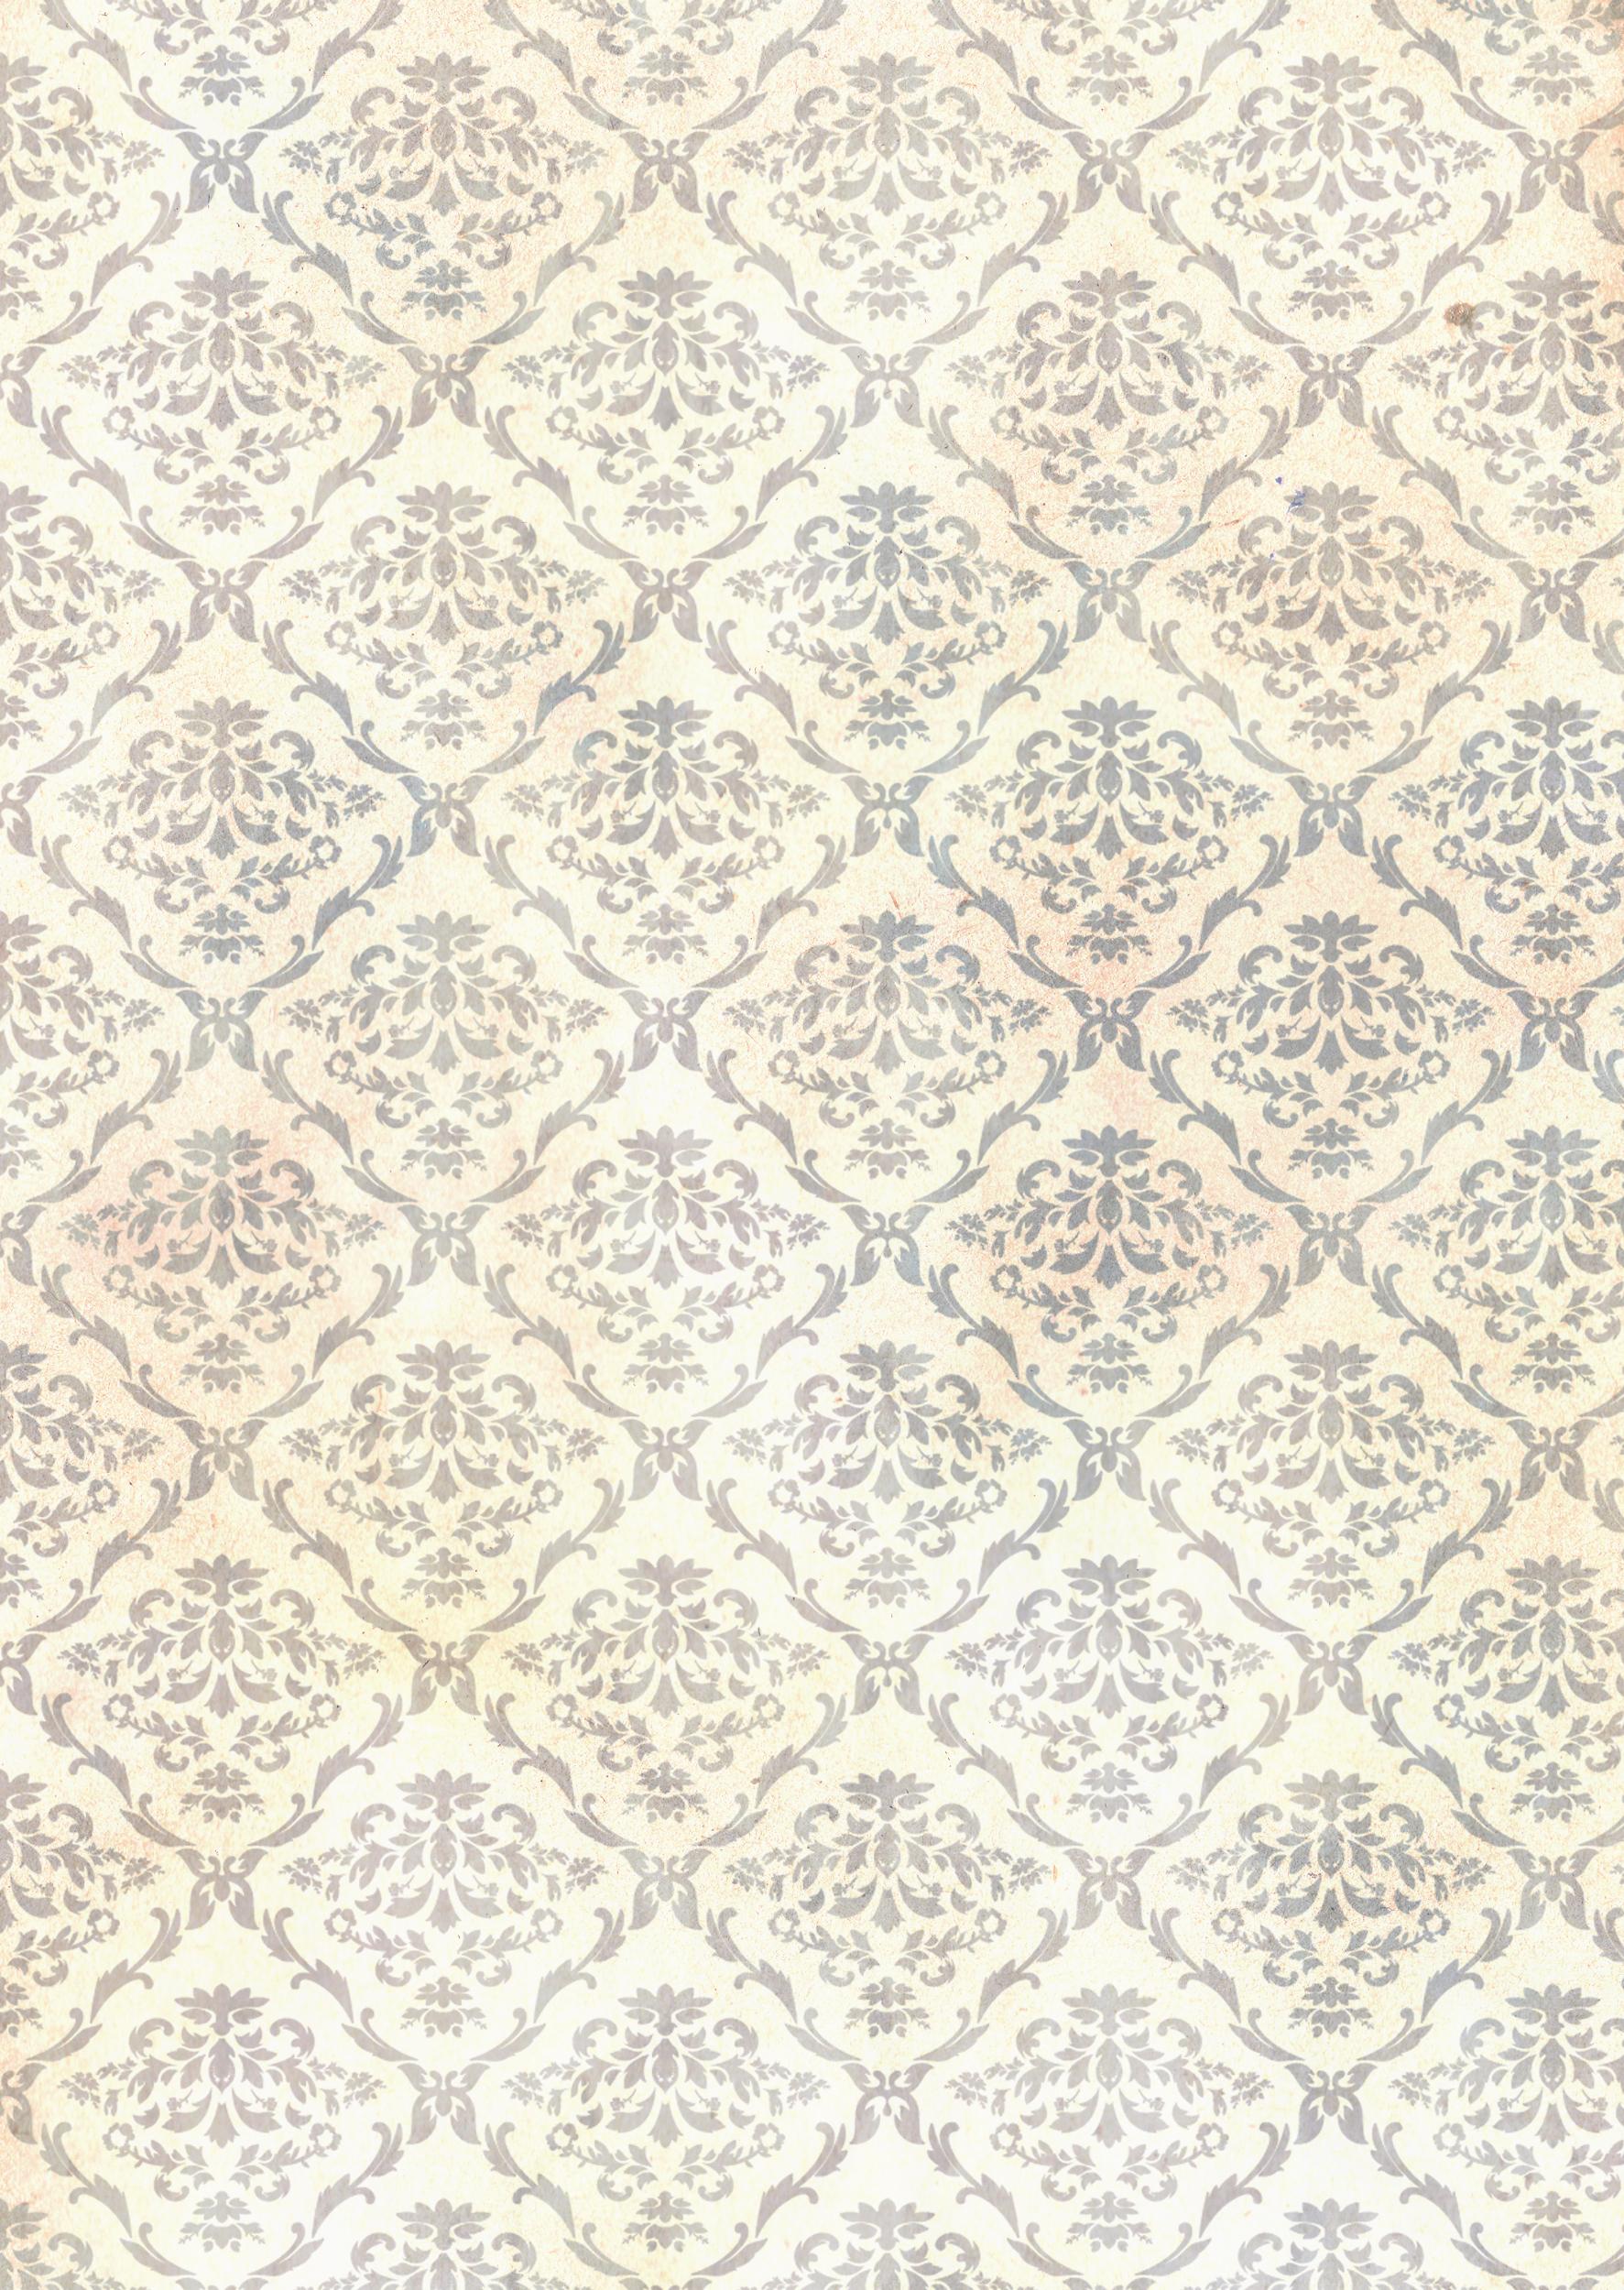 Texture De Papier Peint Haute Resolution Texture De Fond D Ecran Gratuit 1773x2500 Wallpapertip